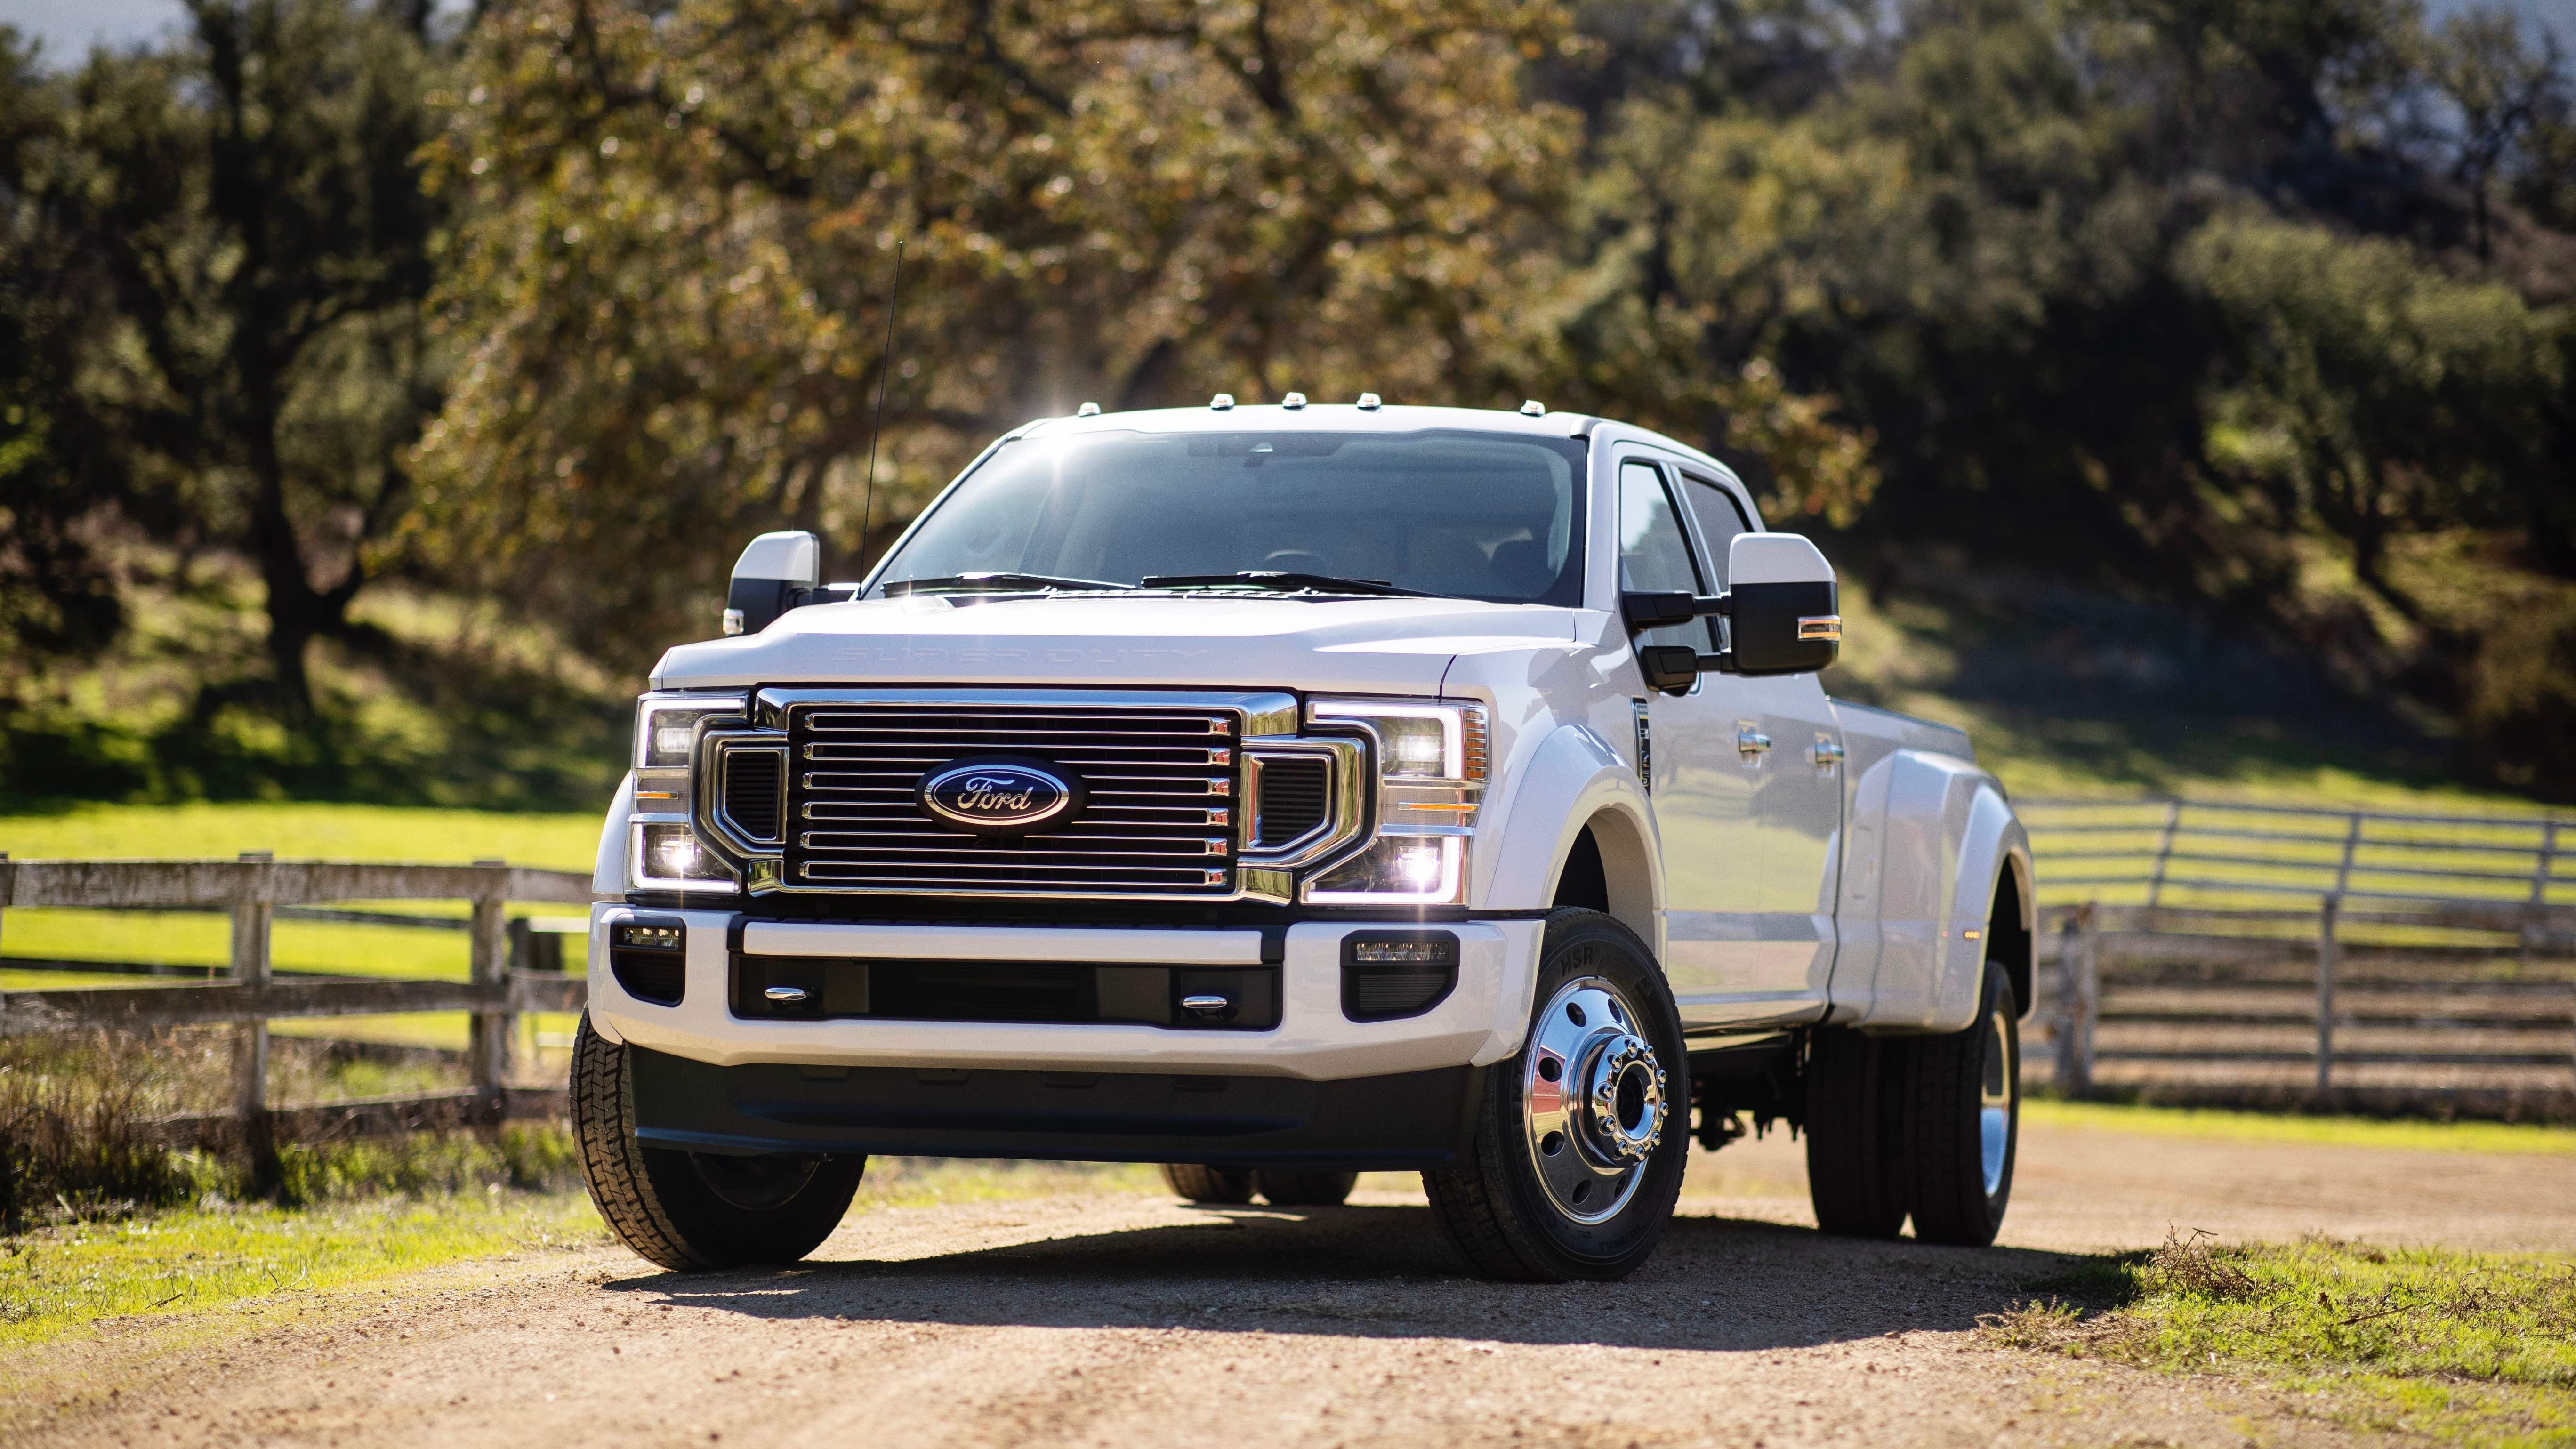 La Ford Serie-F Super Duty llega remodelada para 2020 con una sorpresa de 7.3 litros bajo el capó